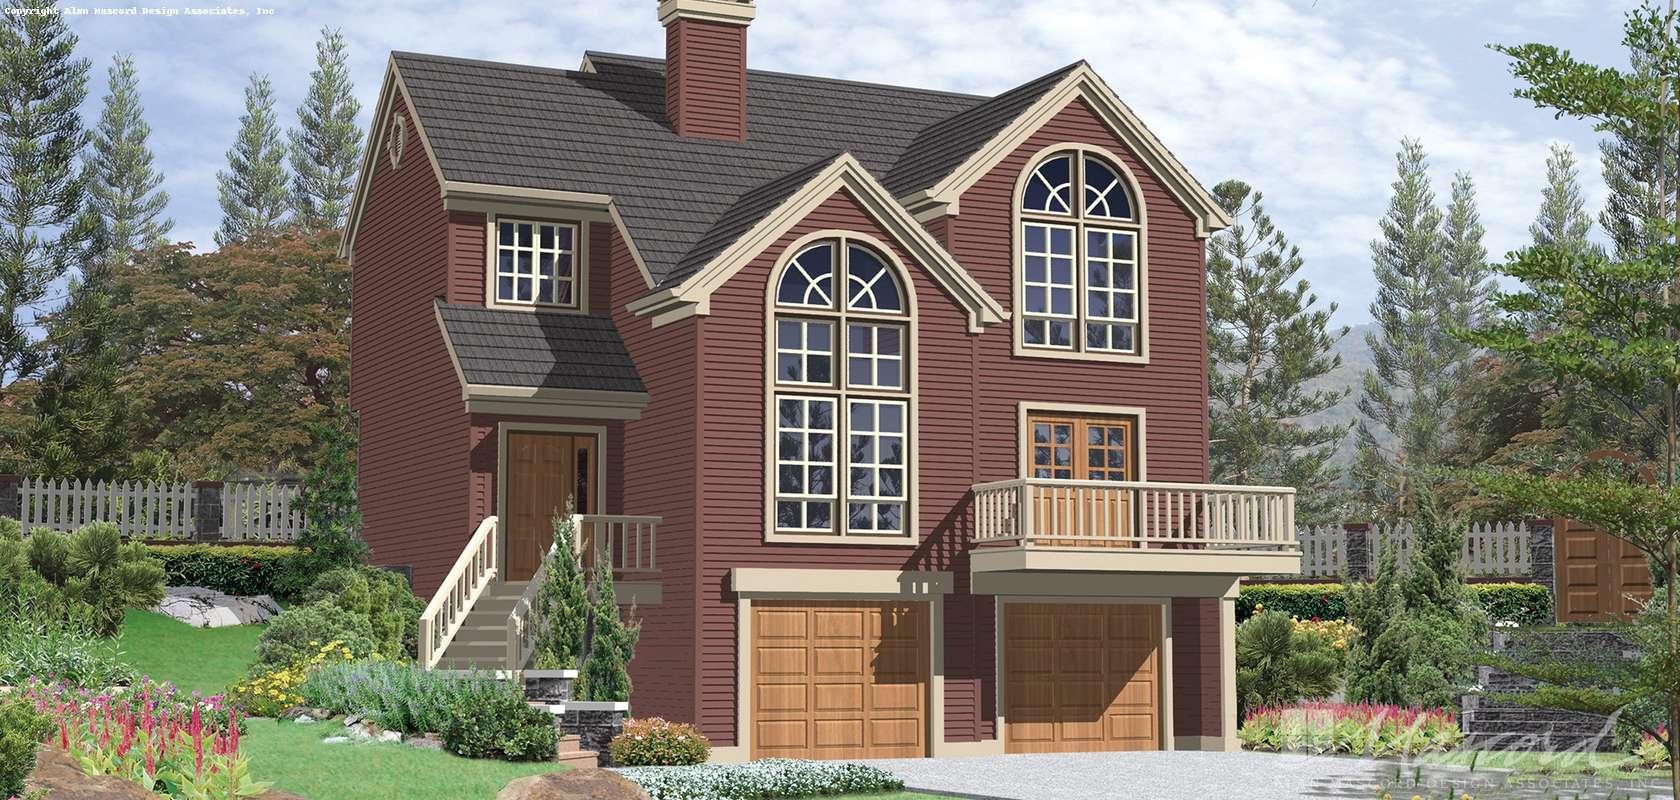 Mascord House Plan 2113A: The Everett